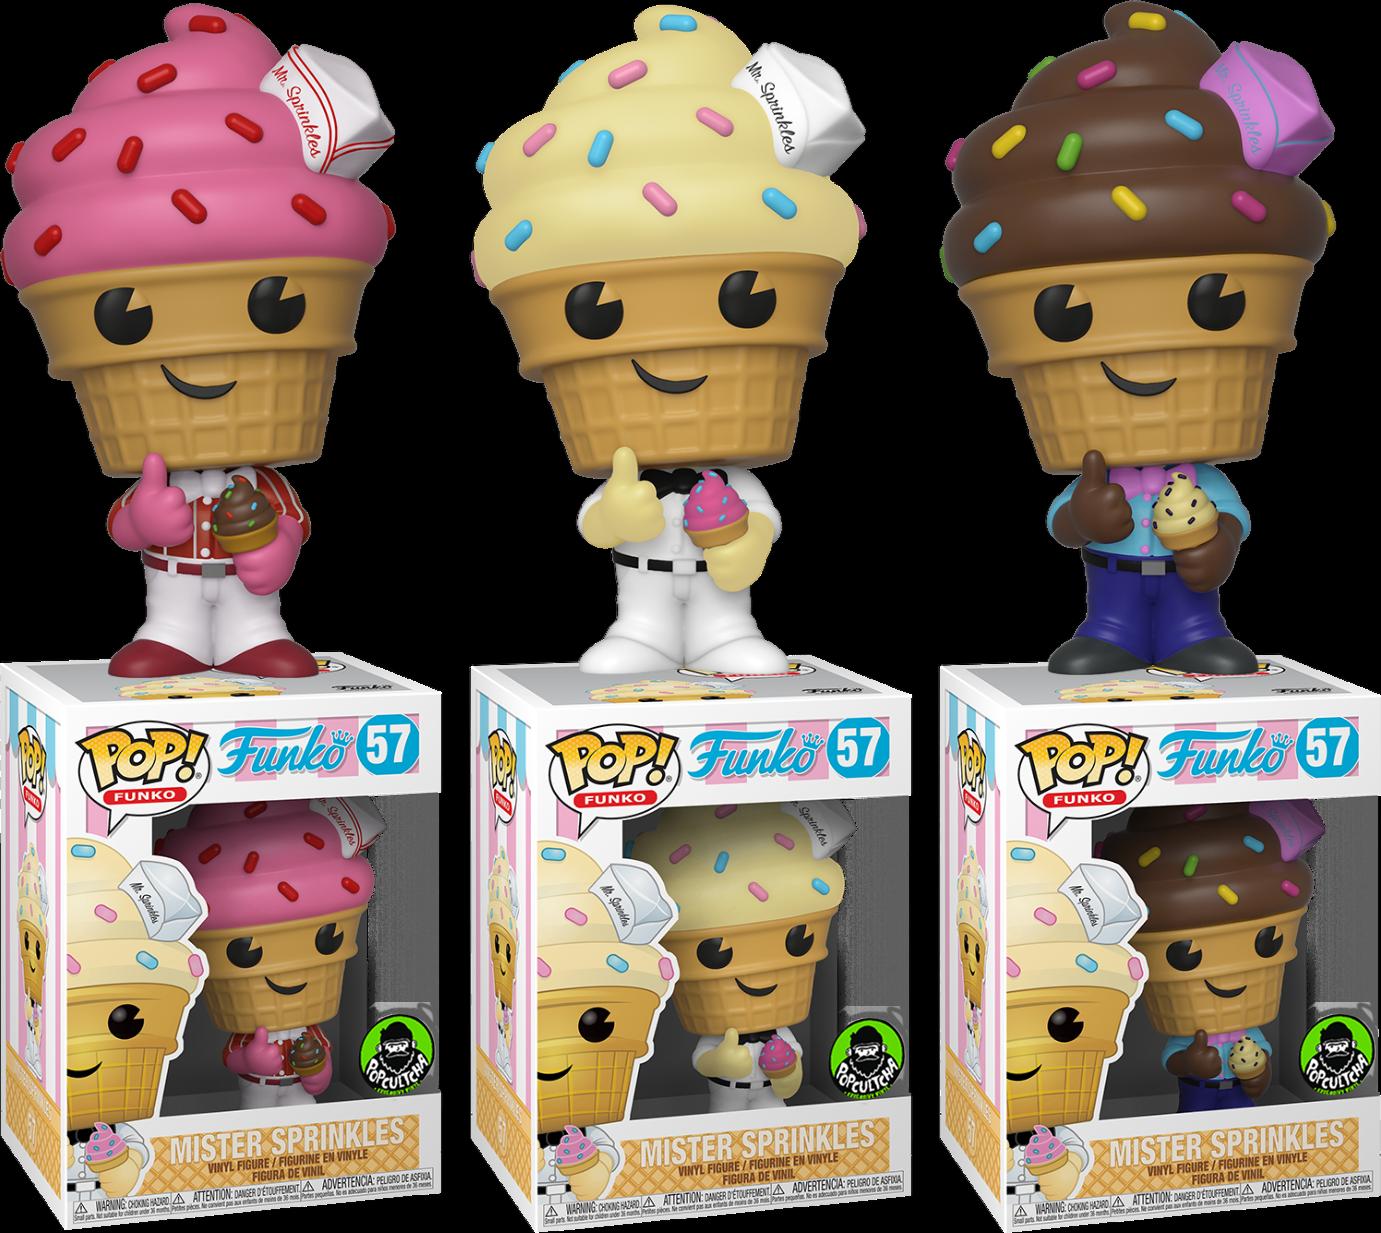 Mister Sprinkles Fantastik Plastik Three diverdeimentoko Pop VINYLs  nuovo in scatolaes  Sconto del 60%